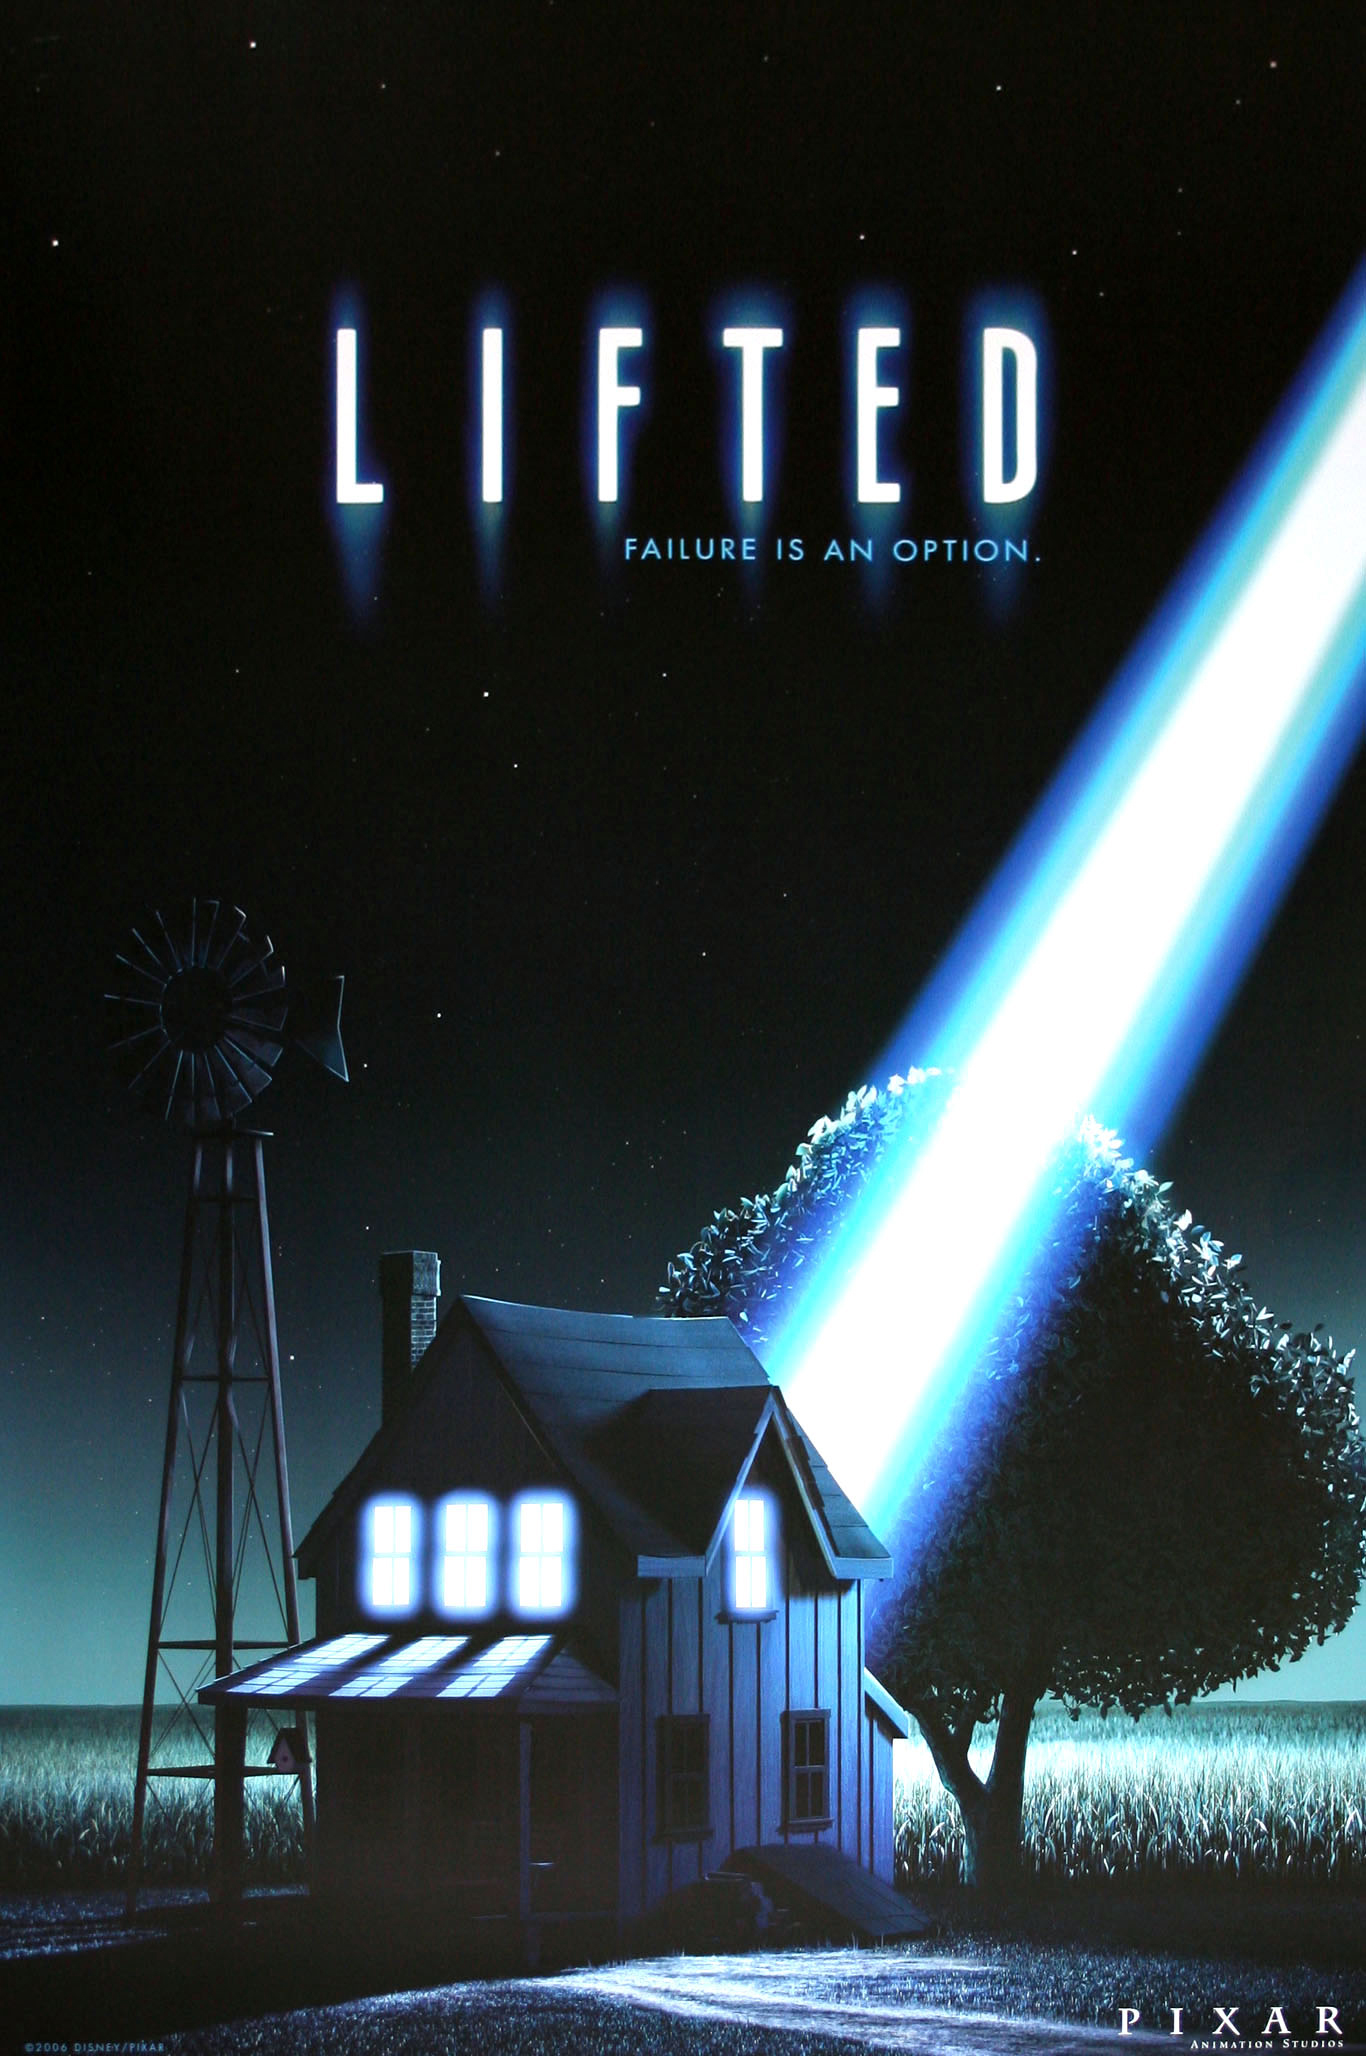 affiche poster extra terrien lifted disney pixar